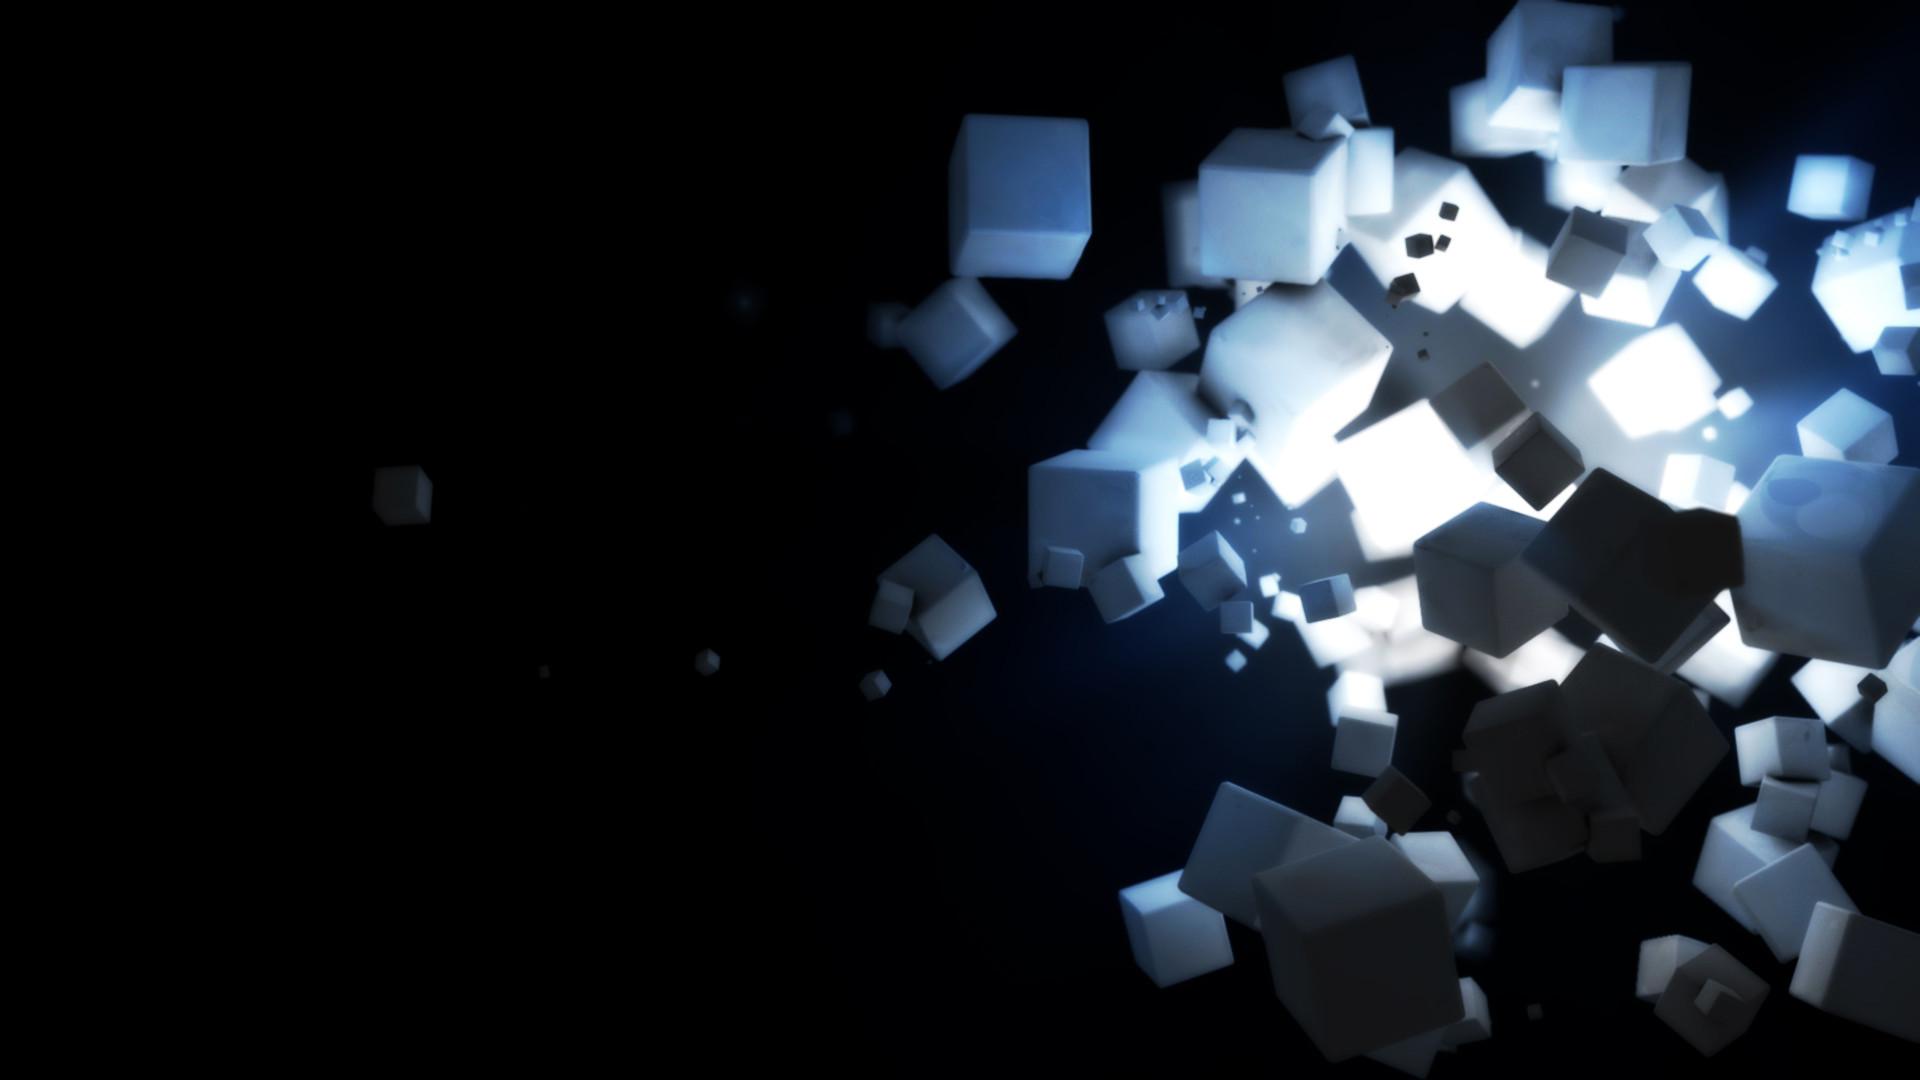 Dark Cubes Wallpapers | HD Wallpapers. Dark Cubes Wallpapers | HD Wallpapers  0 HTML code. 900×480 gaming banner MEMEs